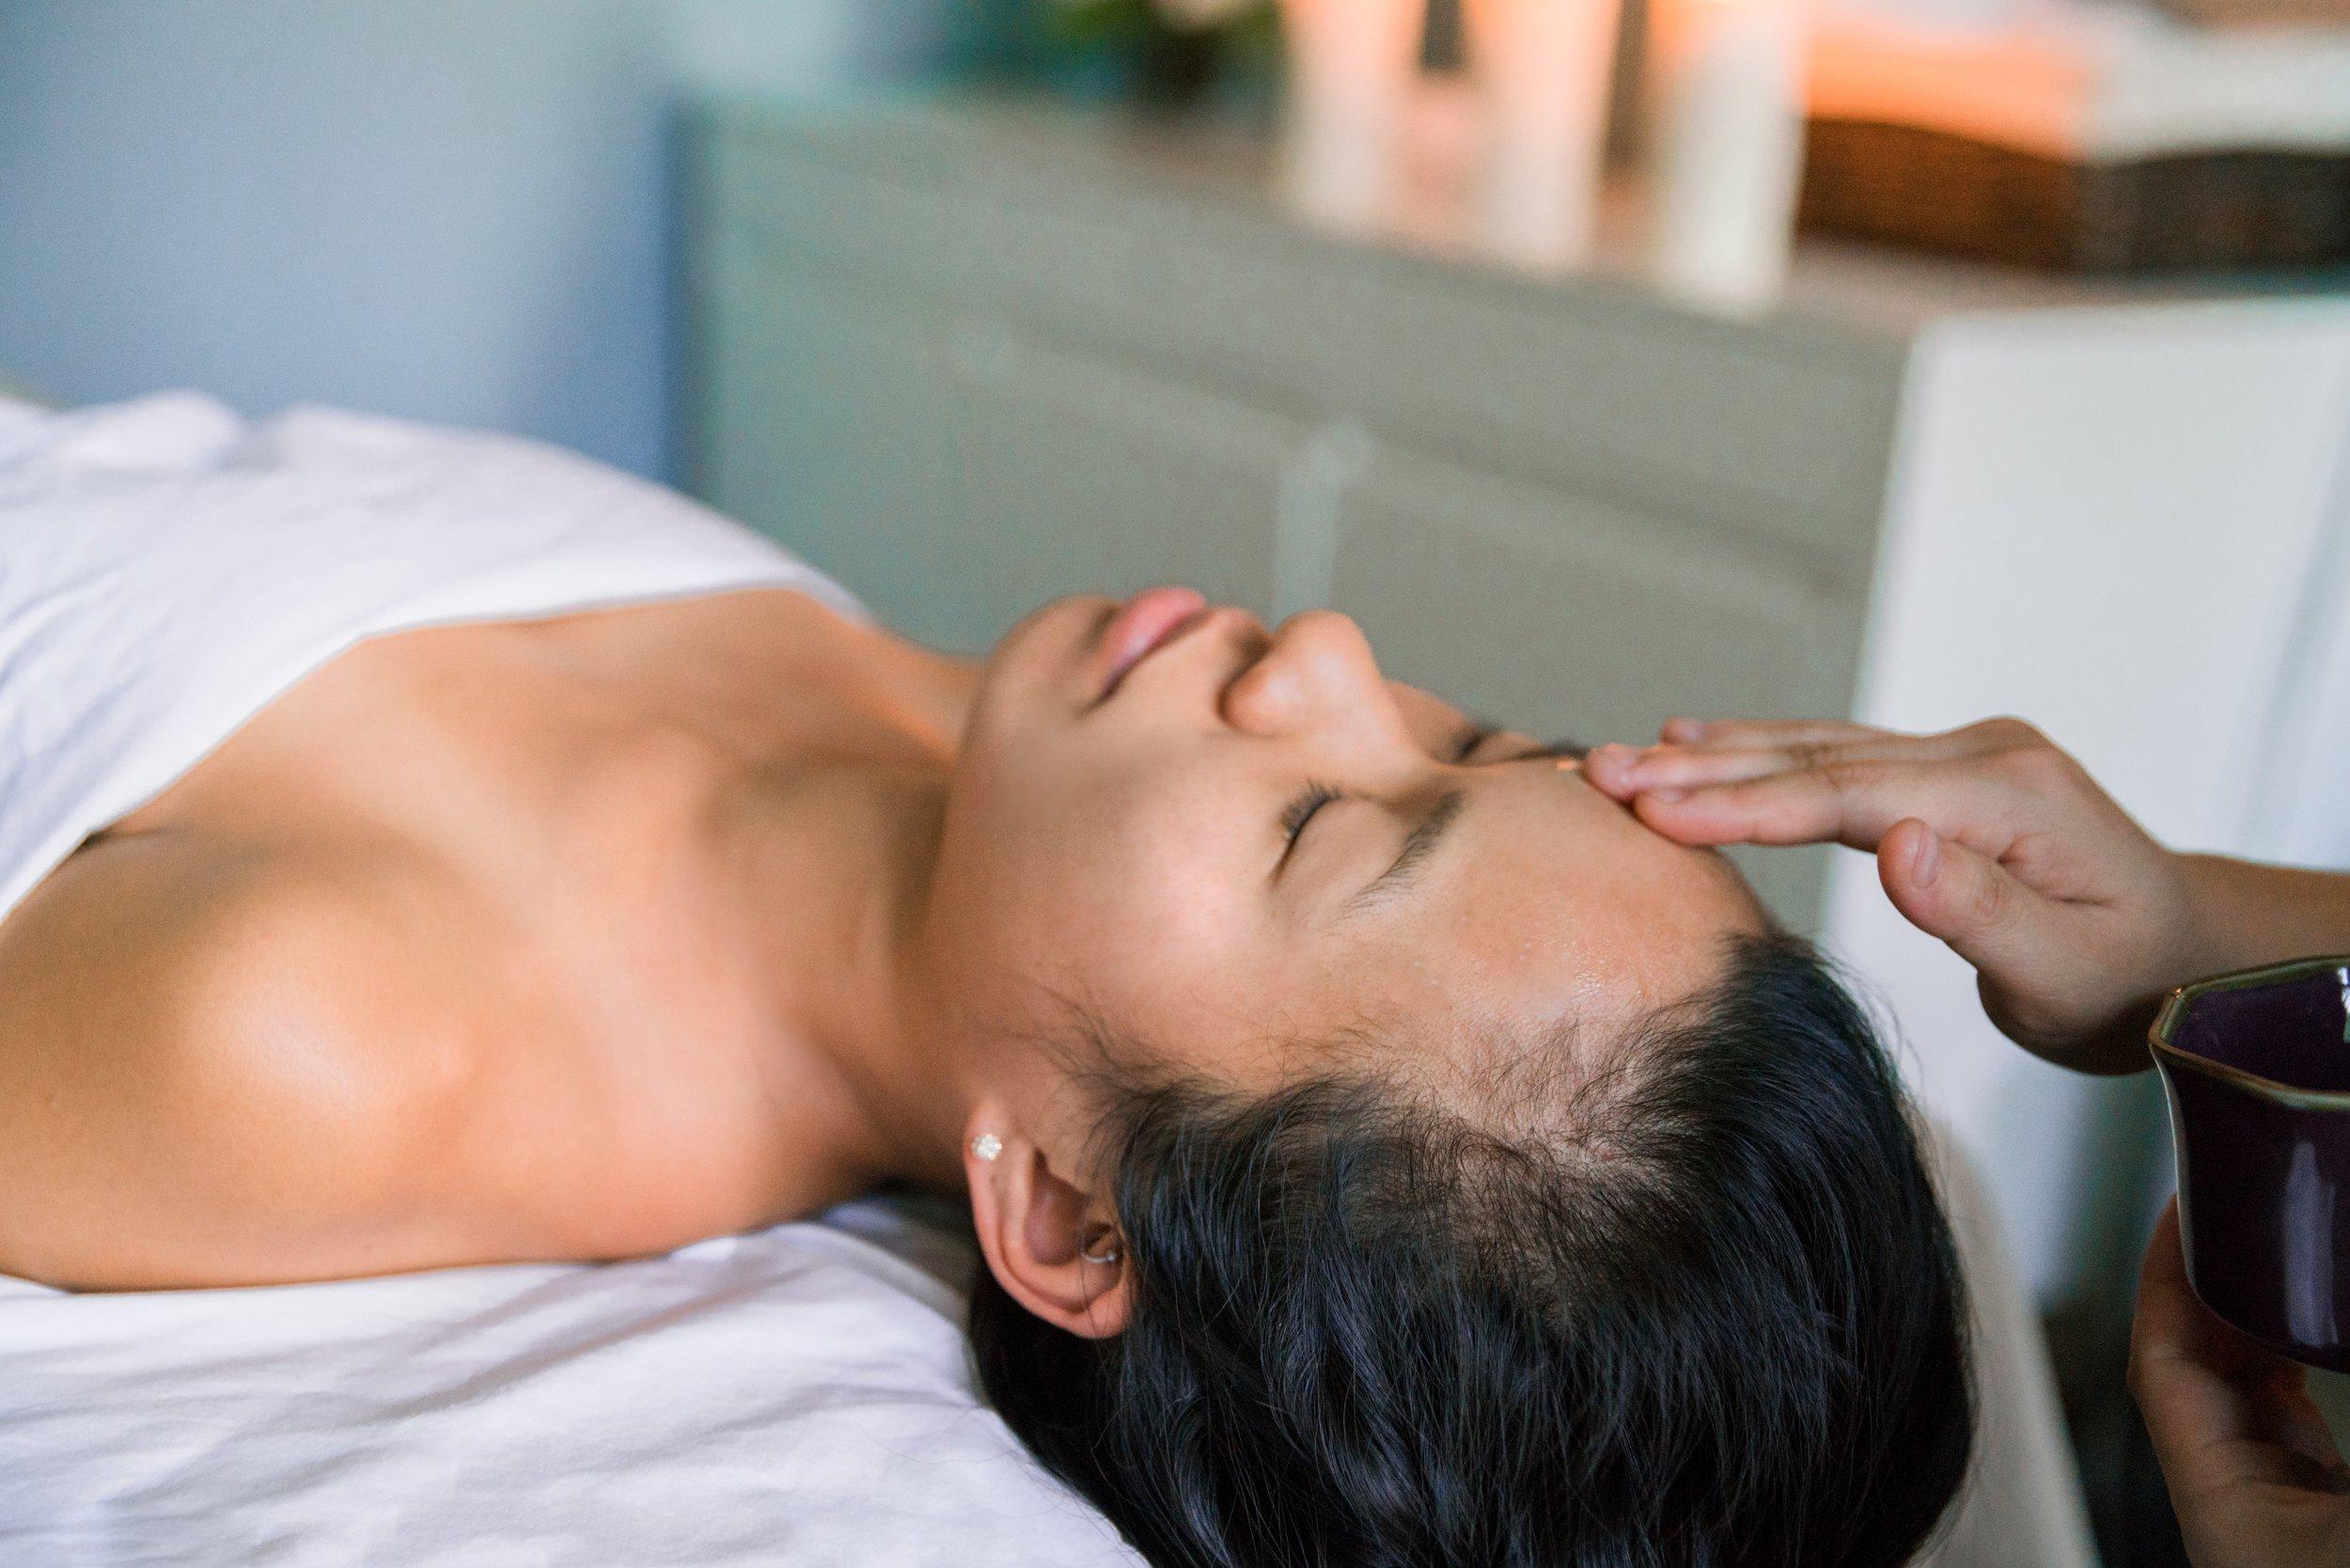 spa-forehead-massage_4460x4460.jpg